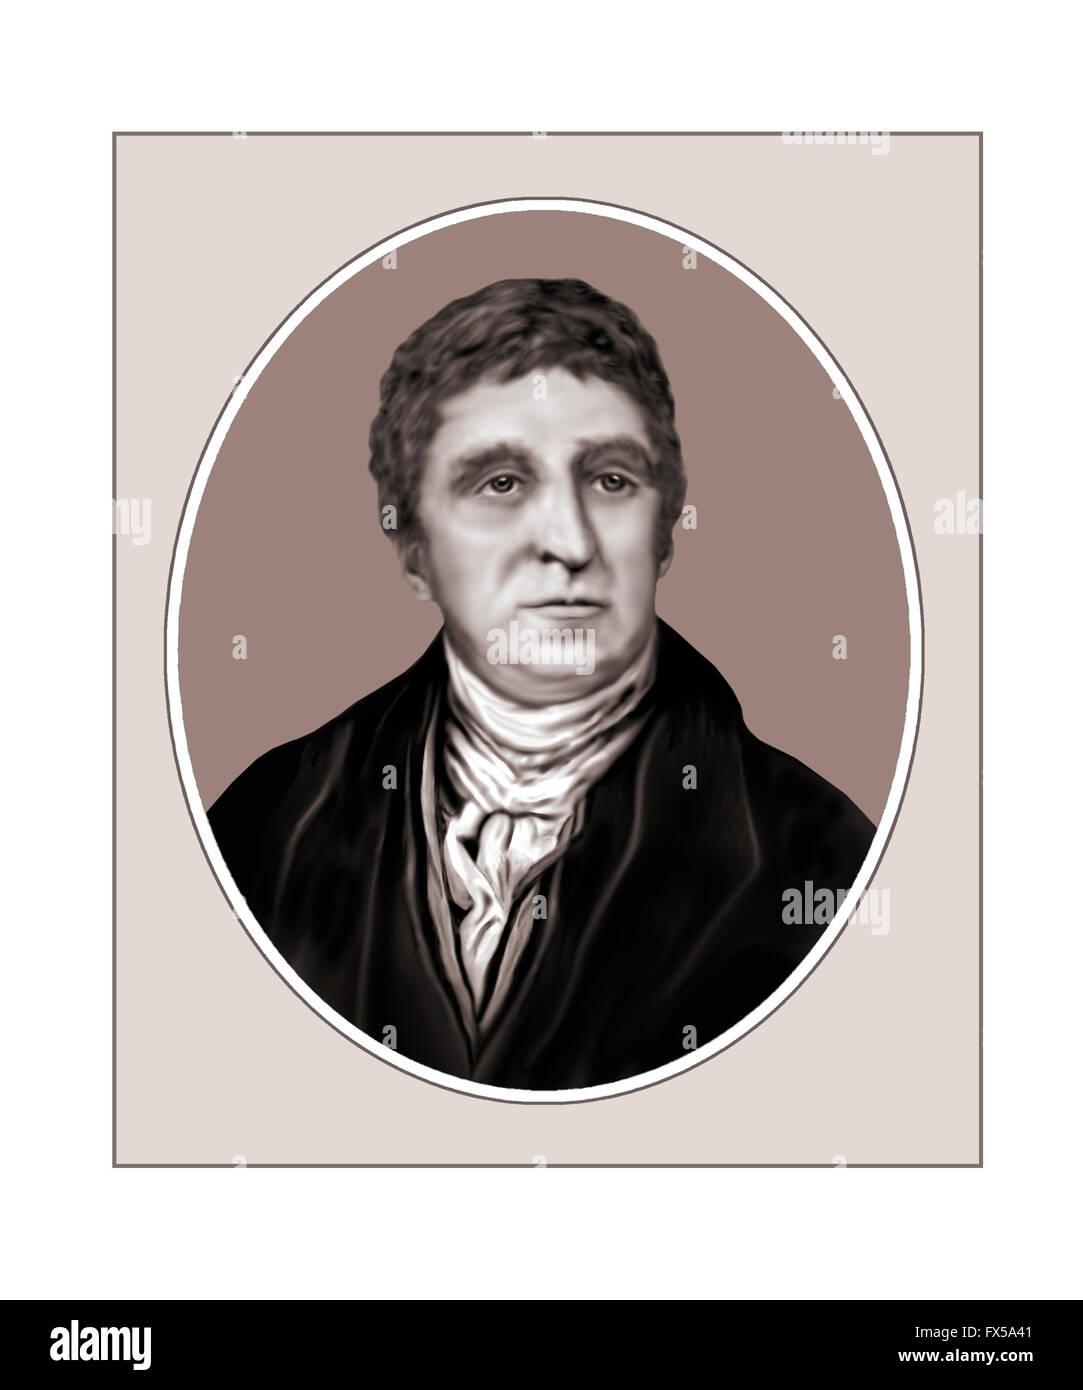 Thomas Telford, 1757-1834, Civil Engineer - Stock Image